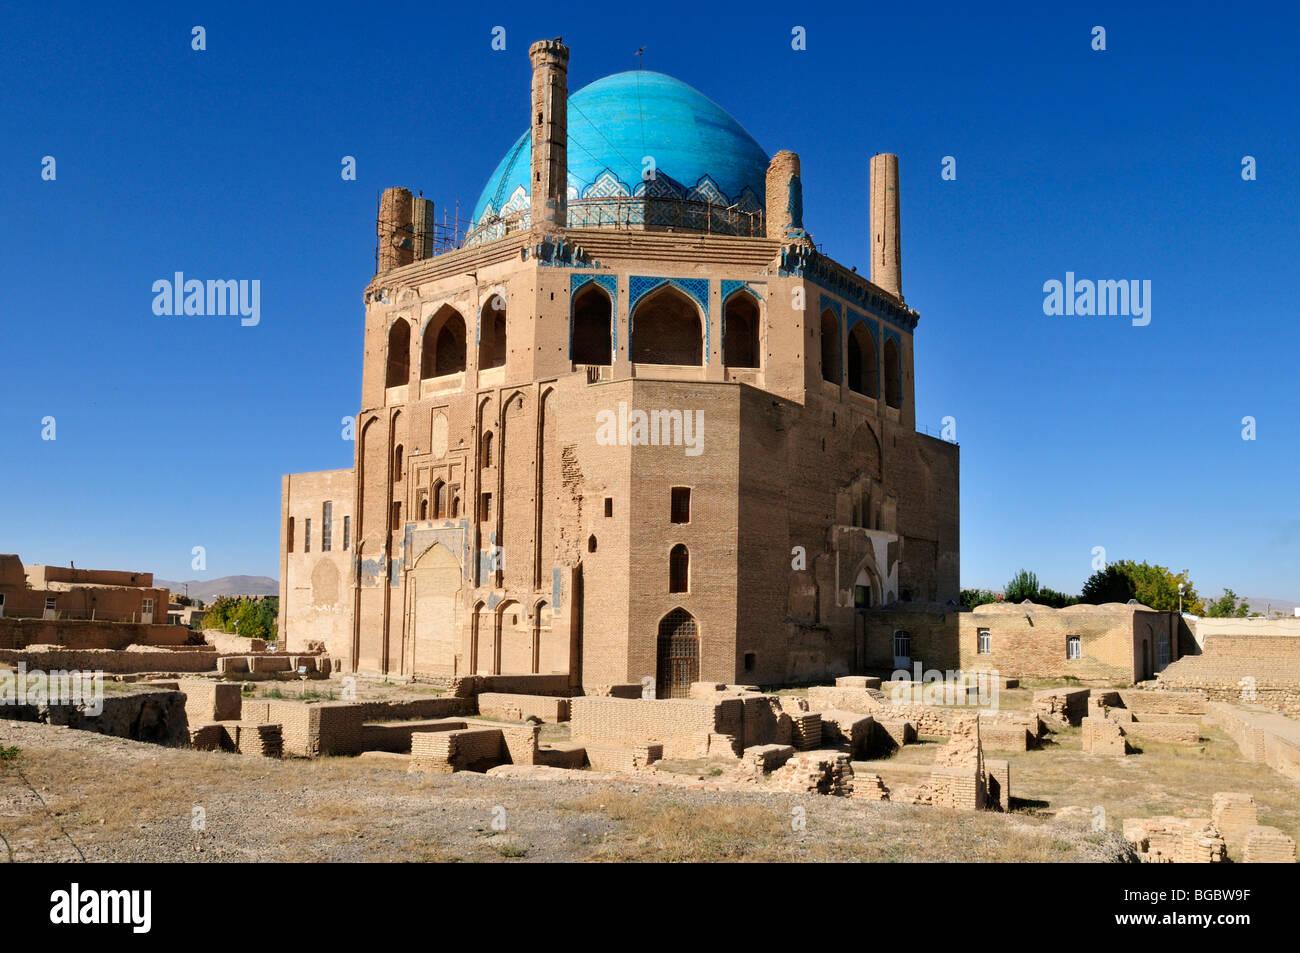 Historic Mausoleum of Oljaytu Soltaniyeh UNESCO World Heritage Stock Photo